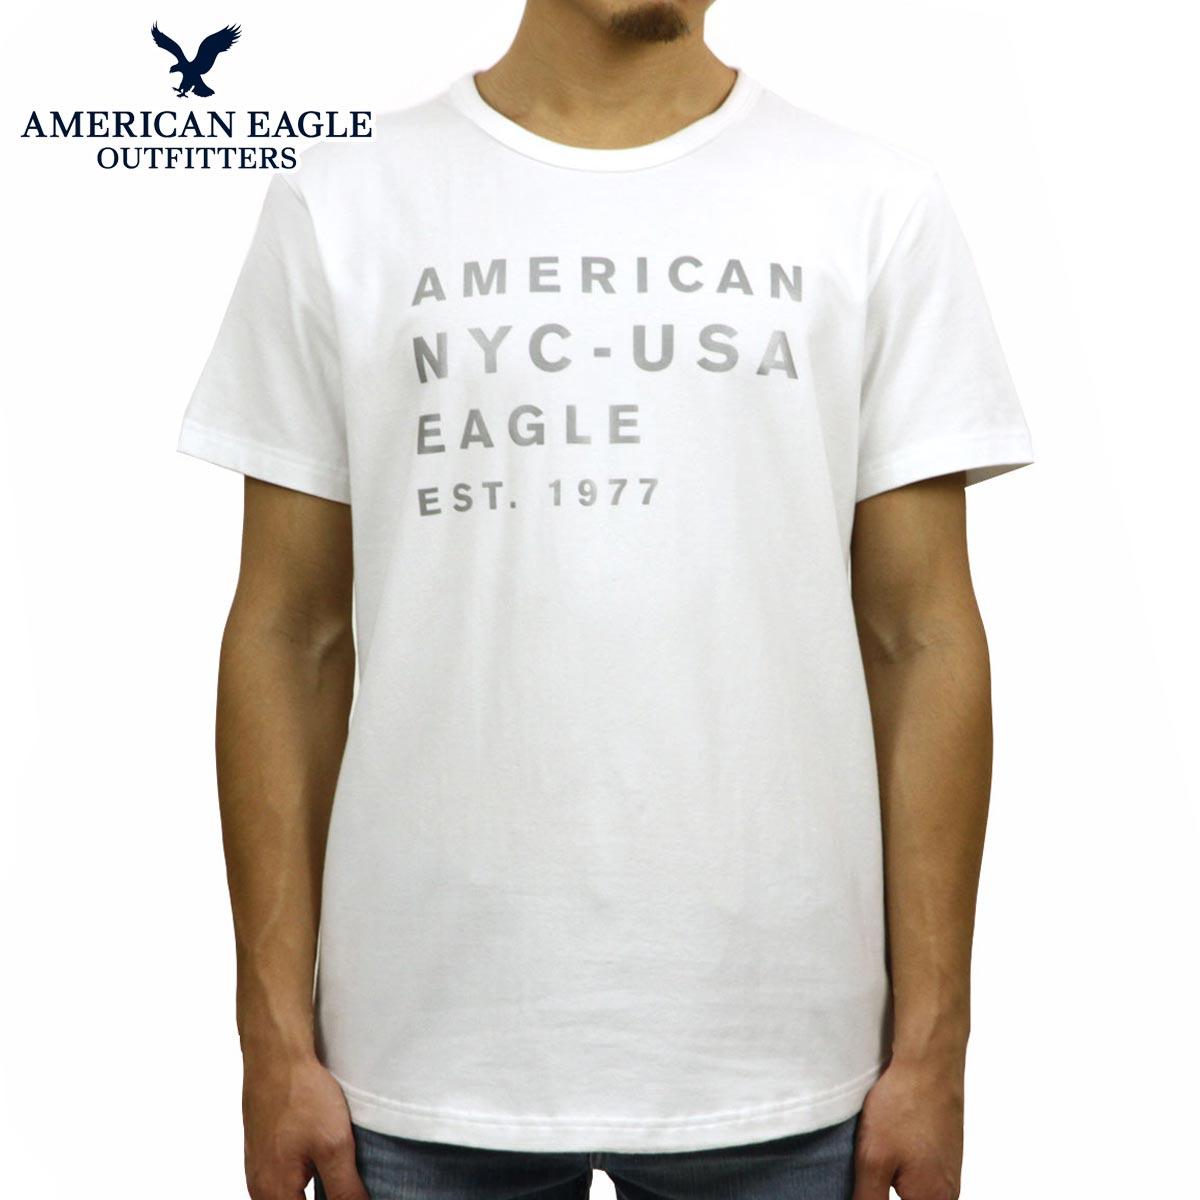 ec8d5bbcc American eagle AMERICAN EAGLE regular article men crew neck short sleeves T-shirt  AE REFLECTIVE ...